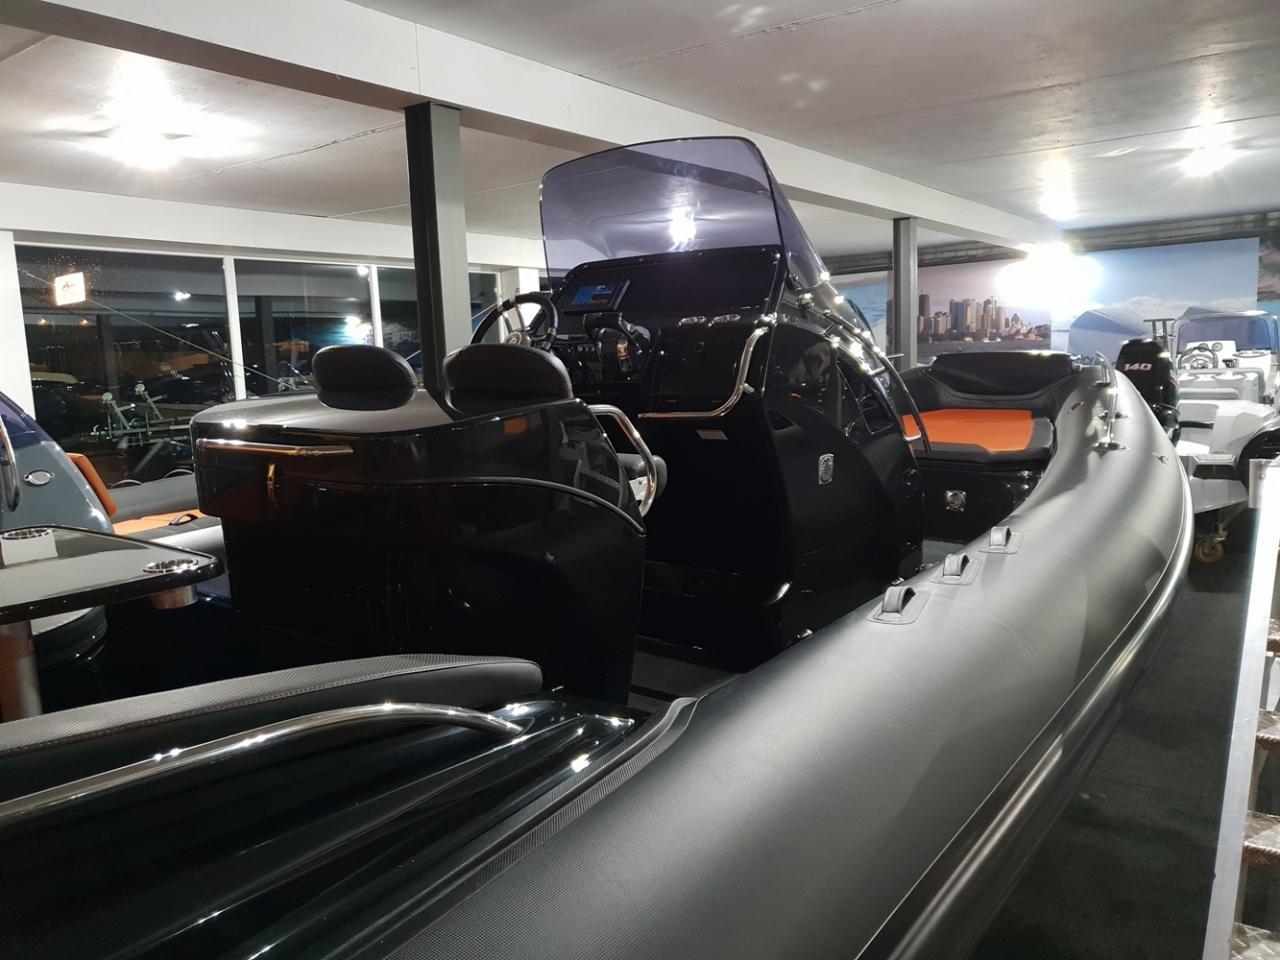 Grand G850L met 2 x Mercury Verado 225 pk 4